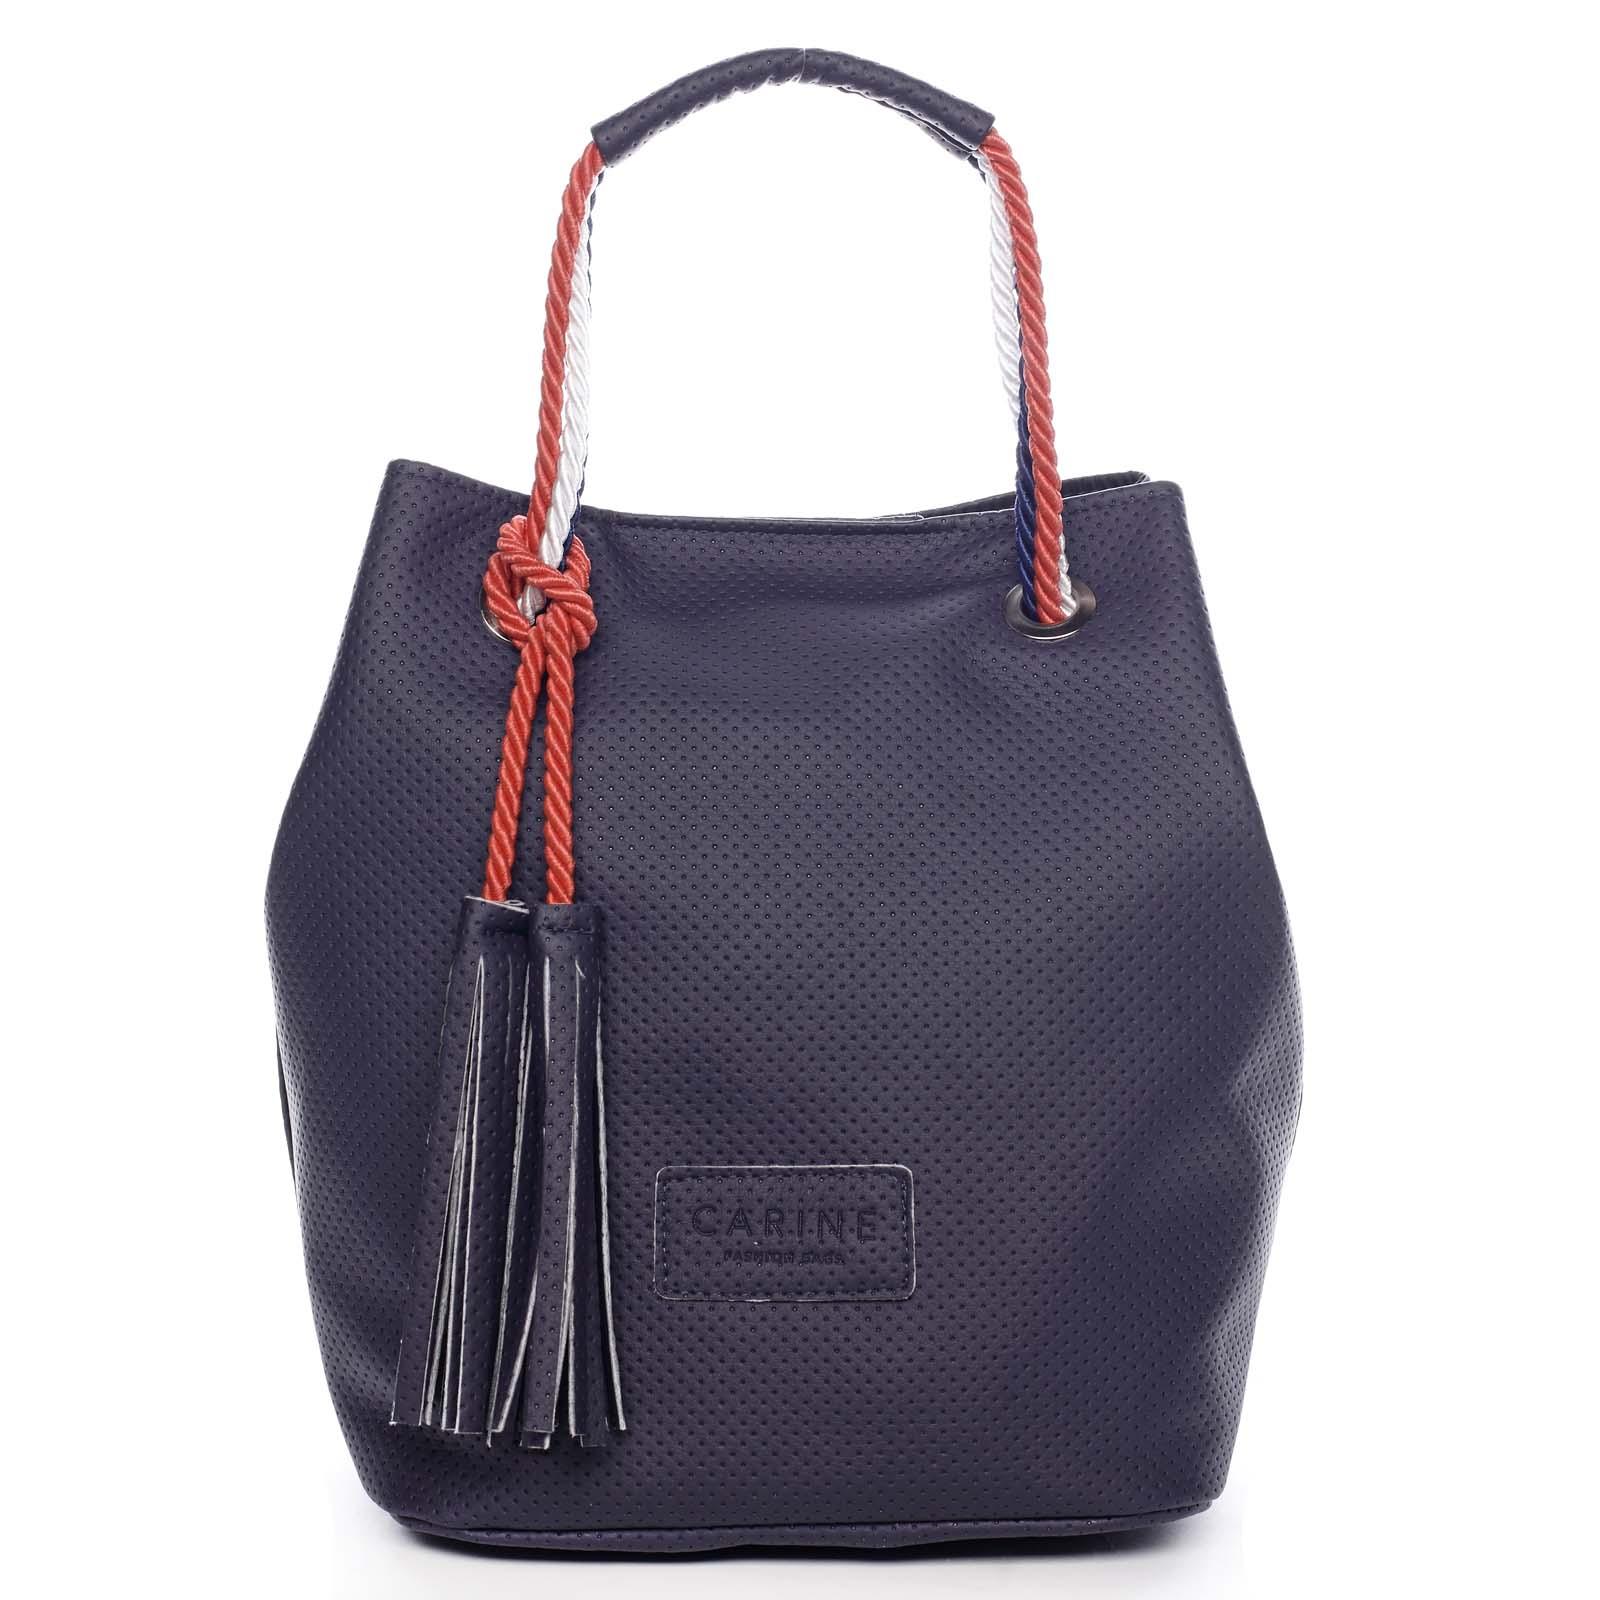 Dámska kabelka tmavomodrá - Carine C2000 tmavo modra